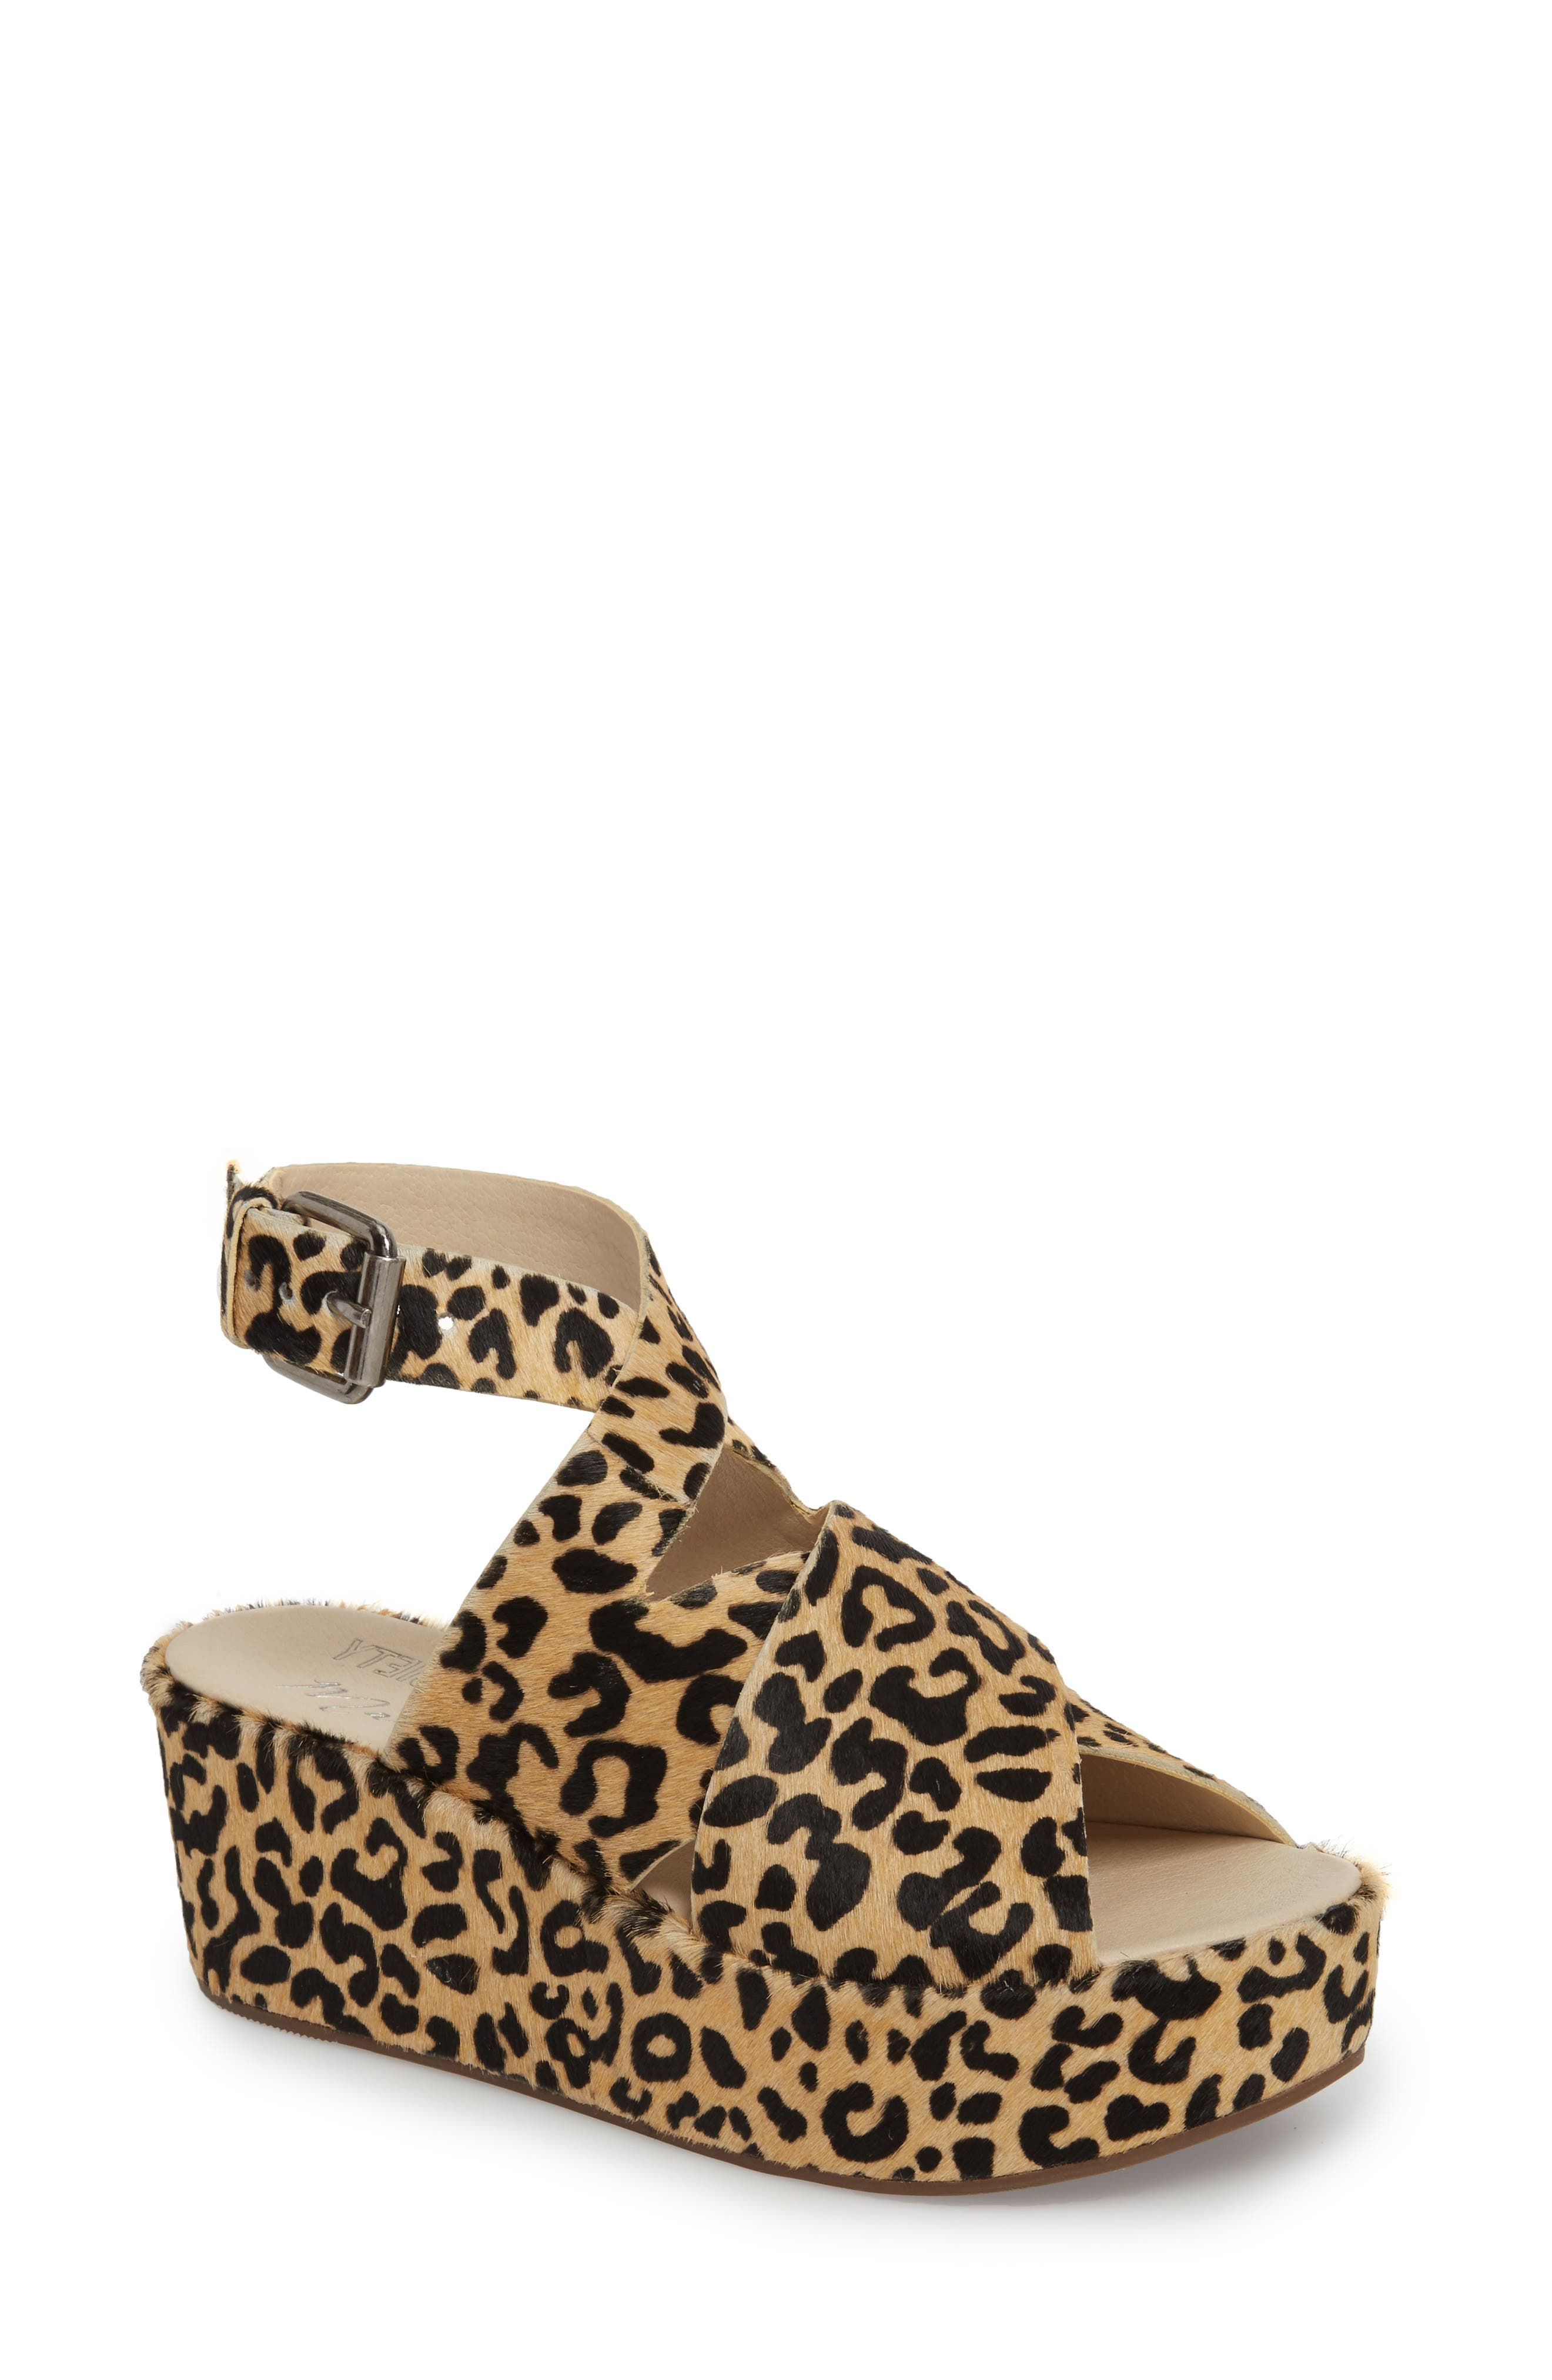 Amuse Society X Matisse Runaway Wedge Sandal